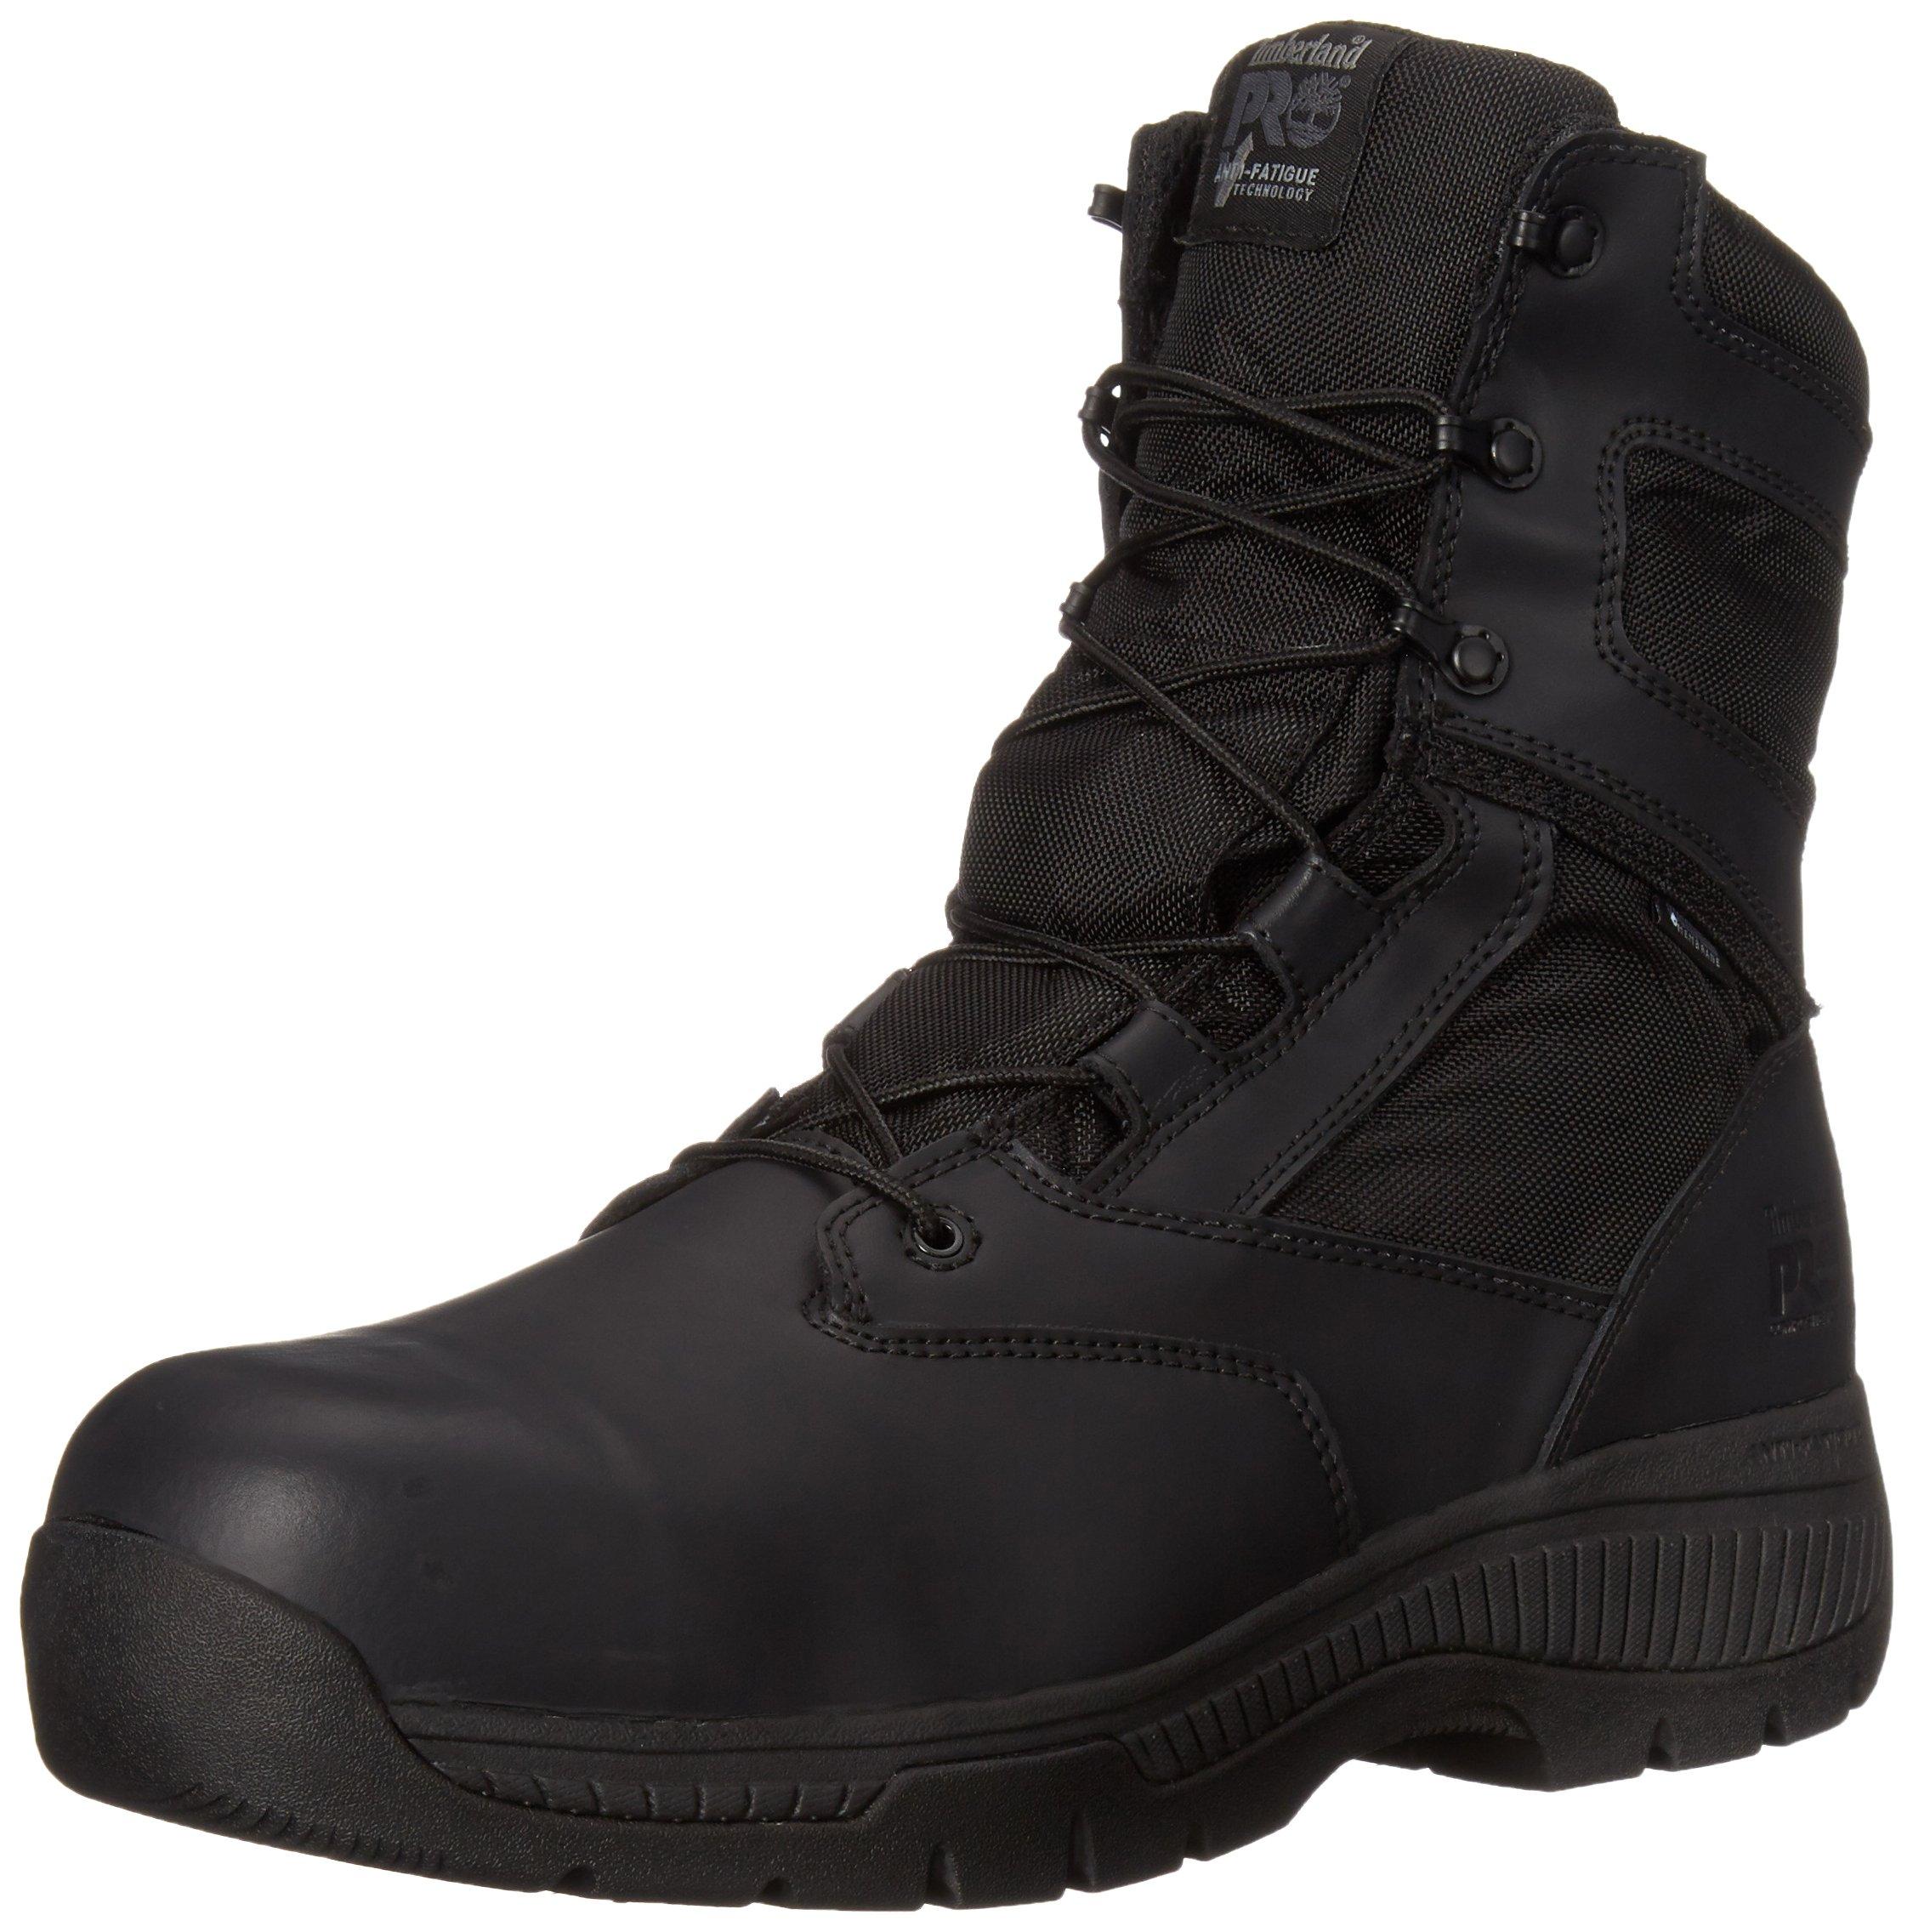 Timberland PRO Men's 8 Inch Valor Comp Toe Waterproof Side Zip Work Boot, Black Smooth Leather Ballistic Nylon, 11.5 M US